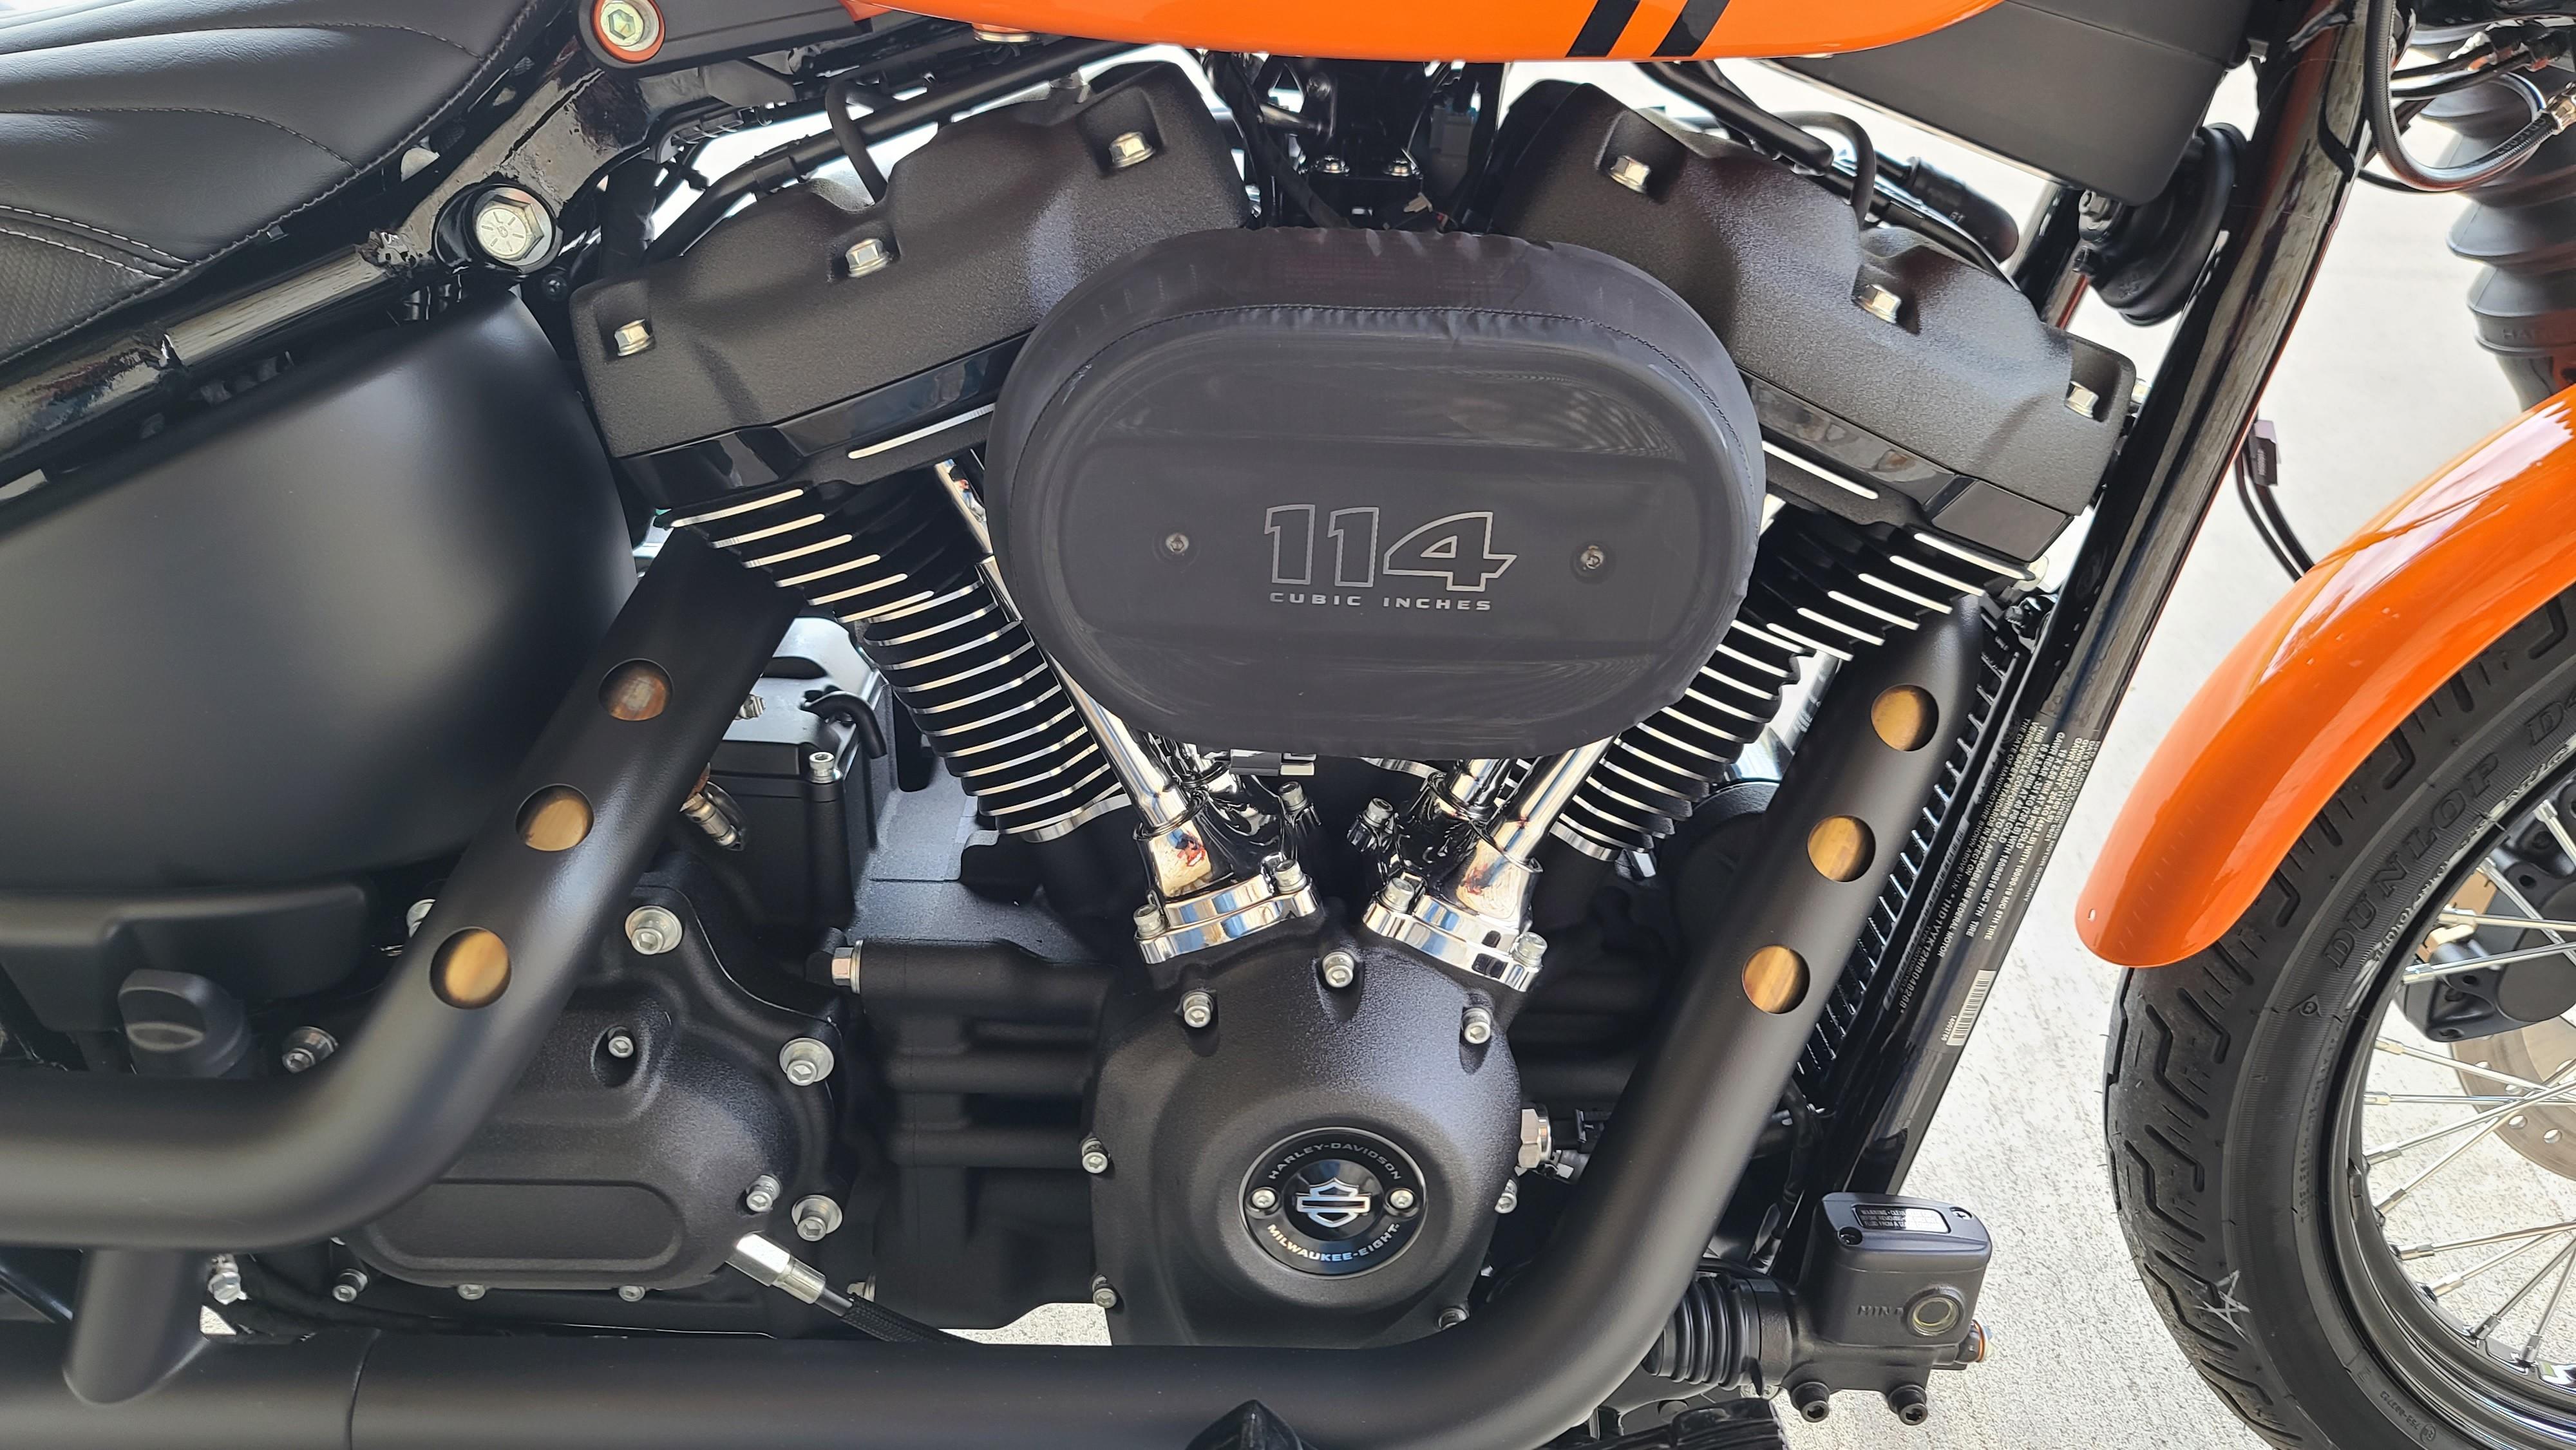 2021 Harley-Davidson Cruiser Street Bob 114 at Harley-Davidson of Waco